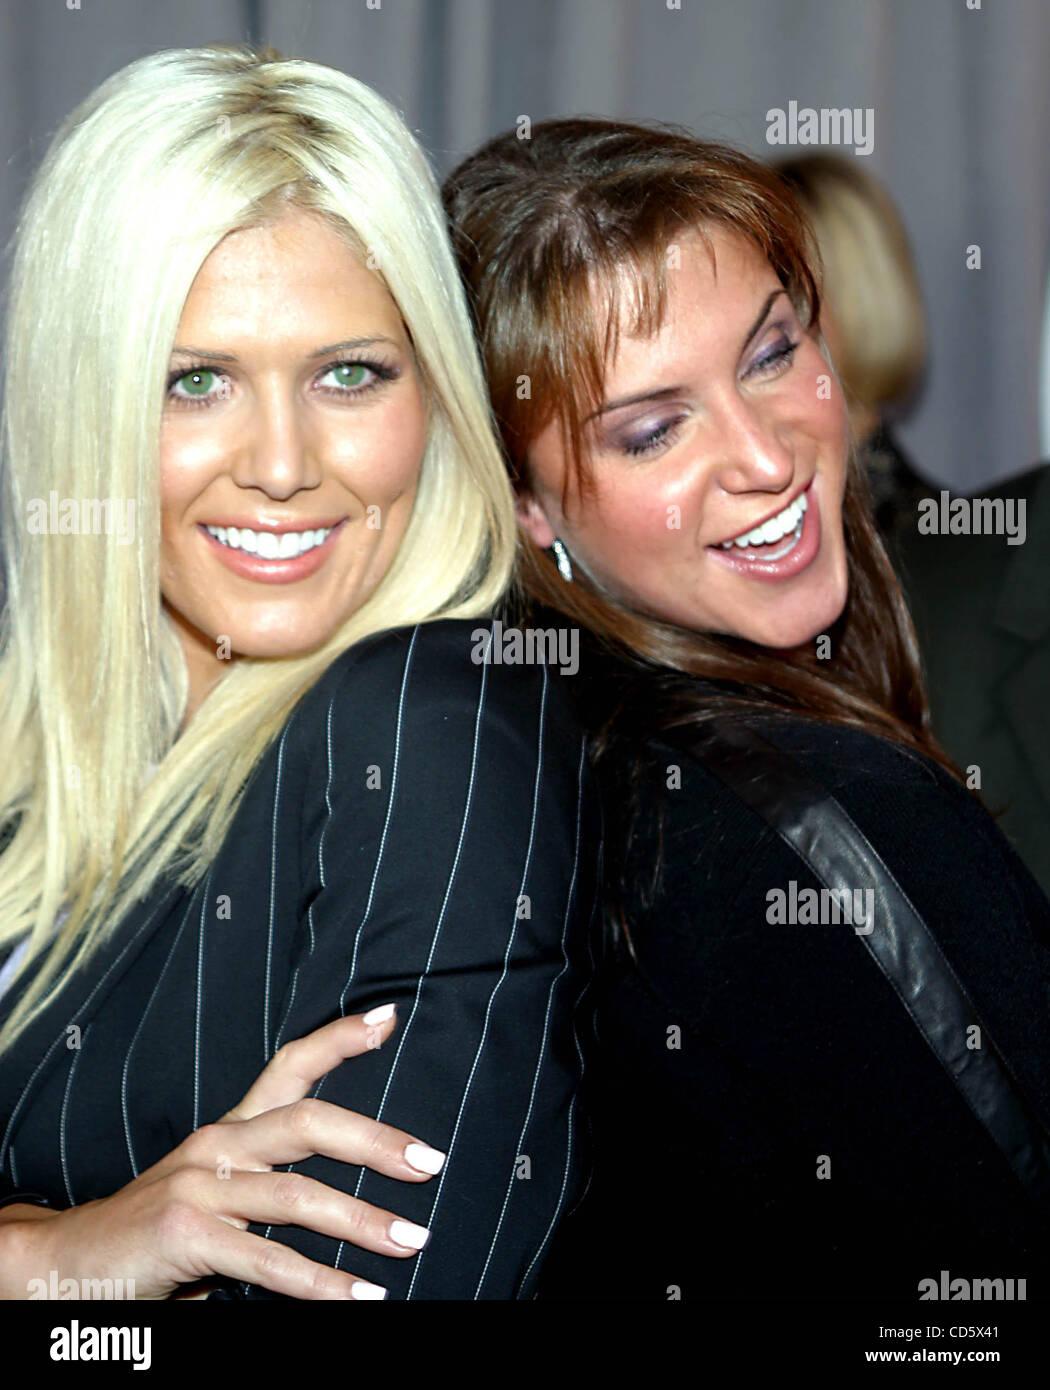 May 15, 2003 - New York, New York, U.S. - TORRIE WILSON AND STEPHANIE McMAHON.K30680RM.2003-2004 UPN UPFRONT PRESENTATION - Stock Image